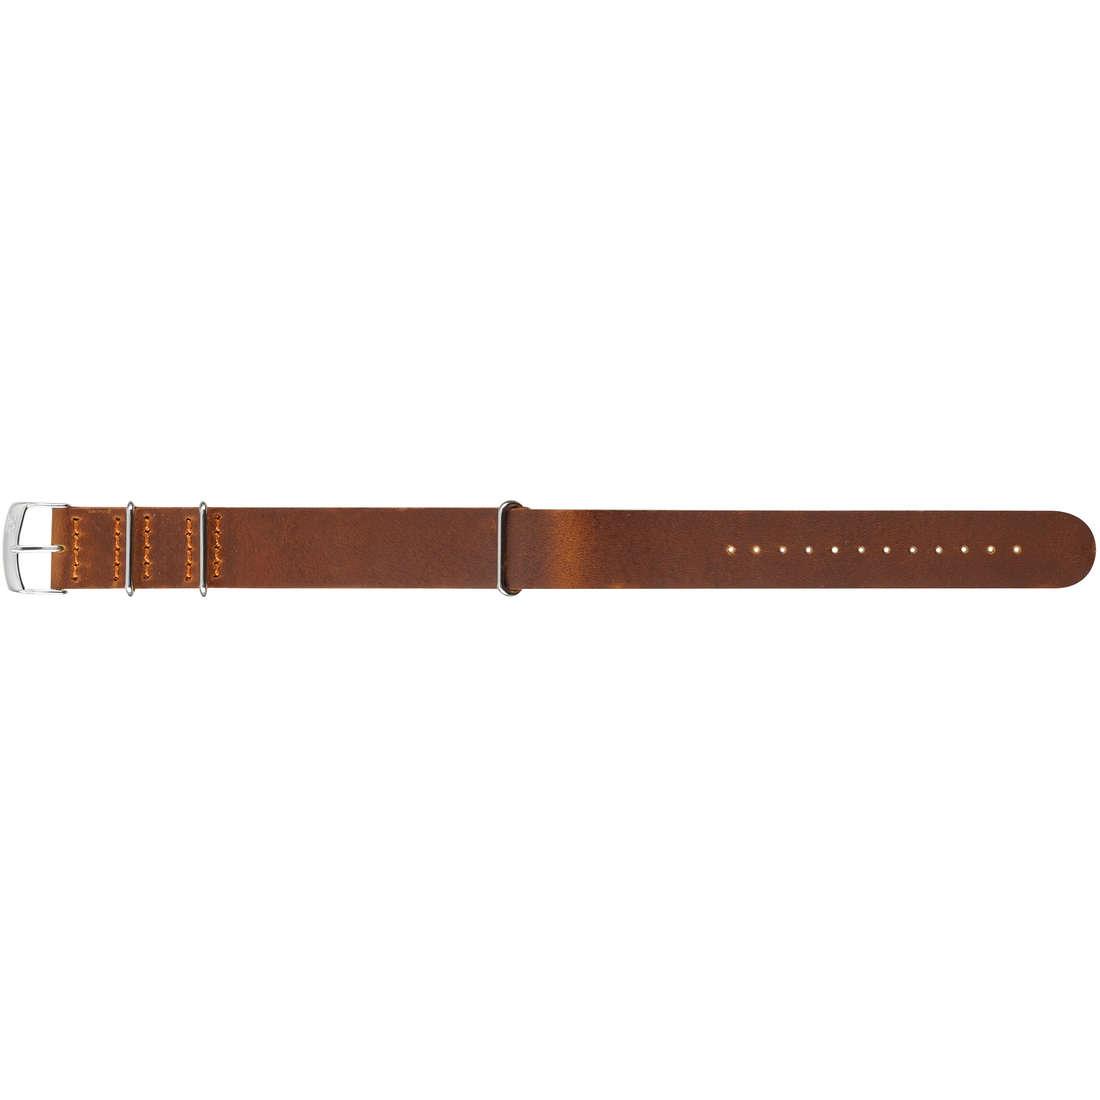 watch watch bands watch straps man Morellato Morellato 1930 A01X4499600041CR18